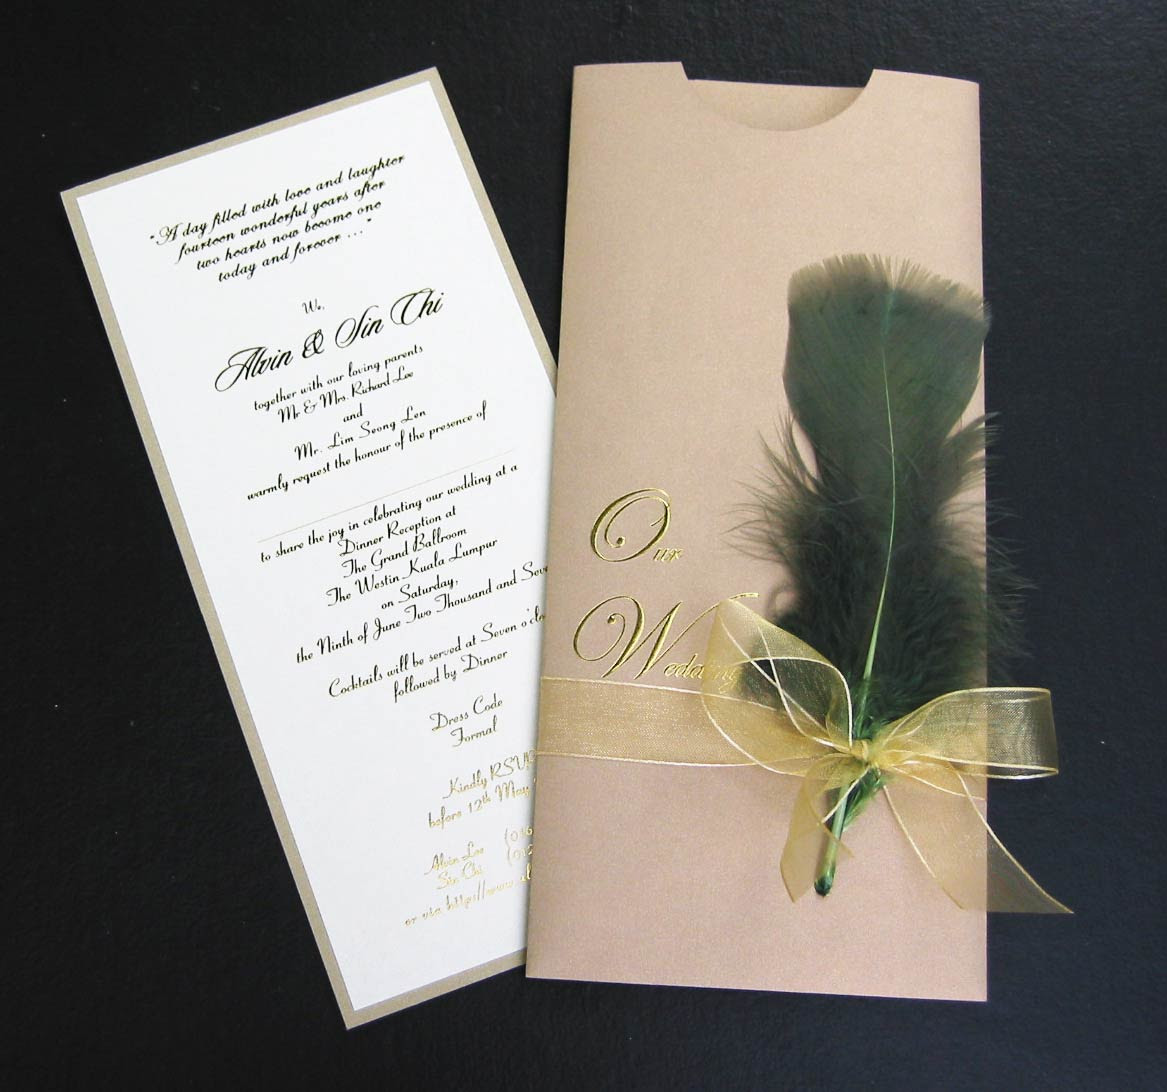 16 Wedding Card Best Design Images Wedding Invitation Card Design Indian Wedding Cards Design And Best Wedding Invitation Cards Designs Newdesignfile Com